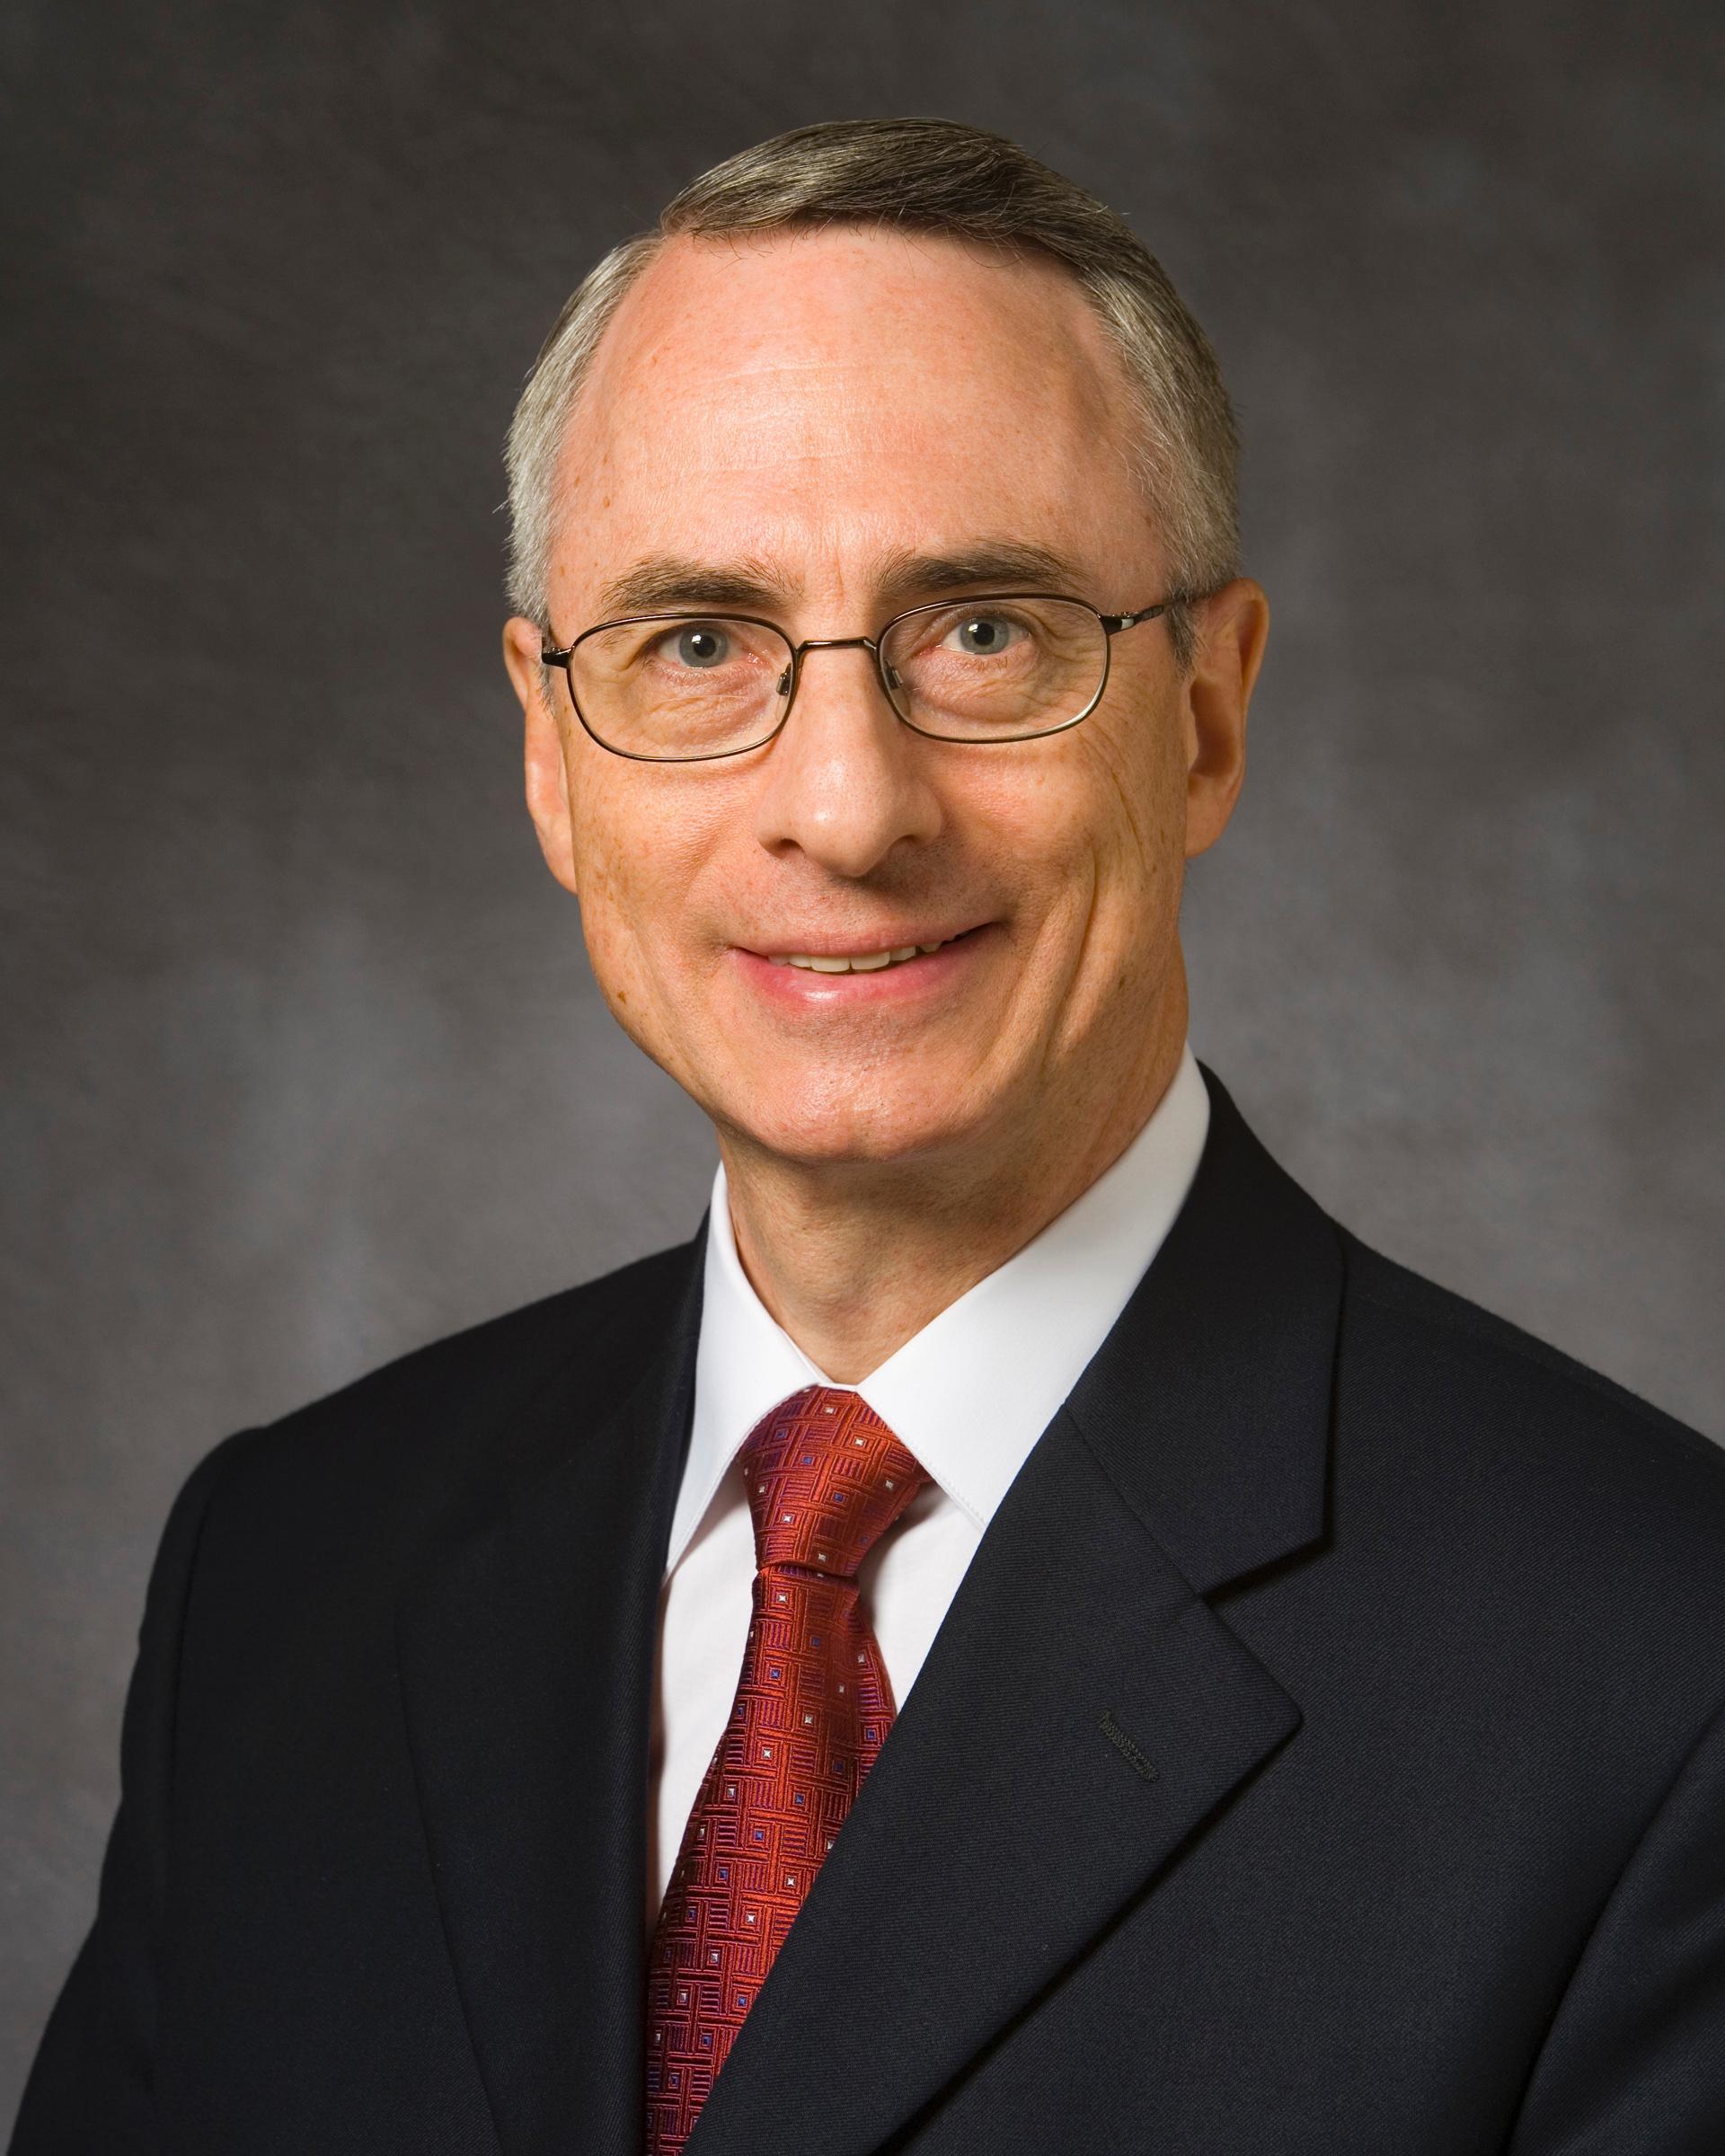 Elder Claudio D. Zivic, emeritus General Authority Seventy